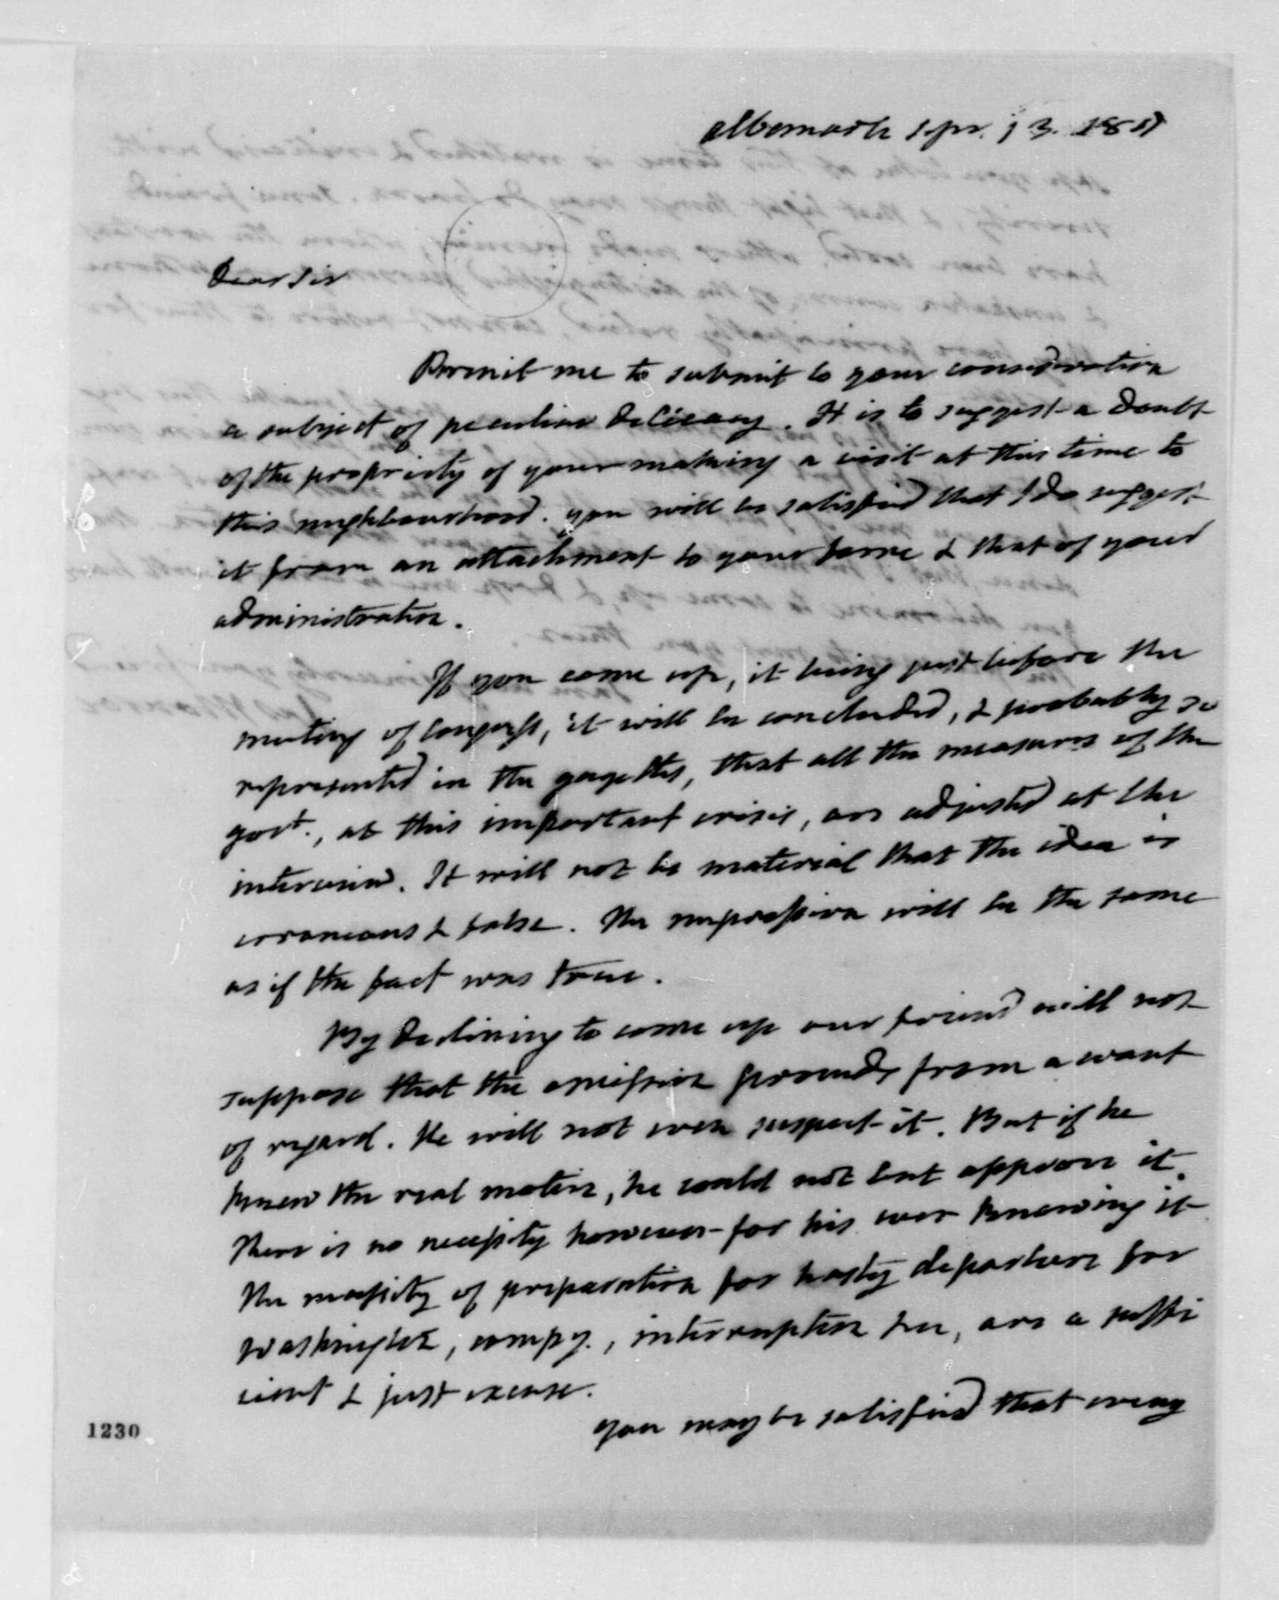 James Monroe to James Madison, September 13, 1811.